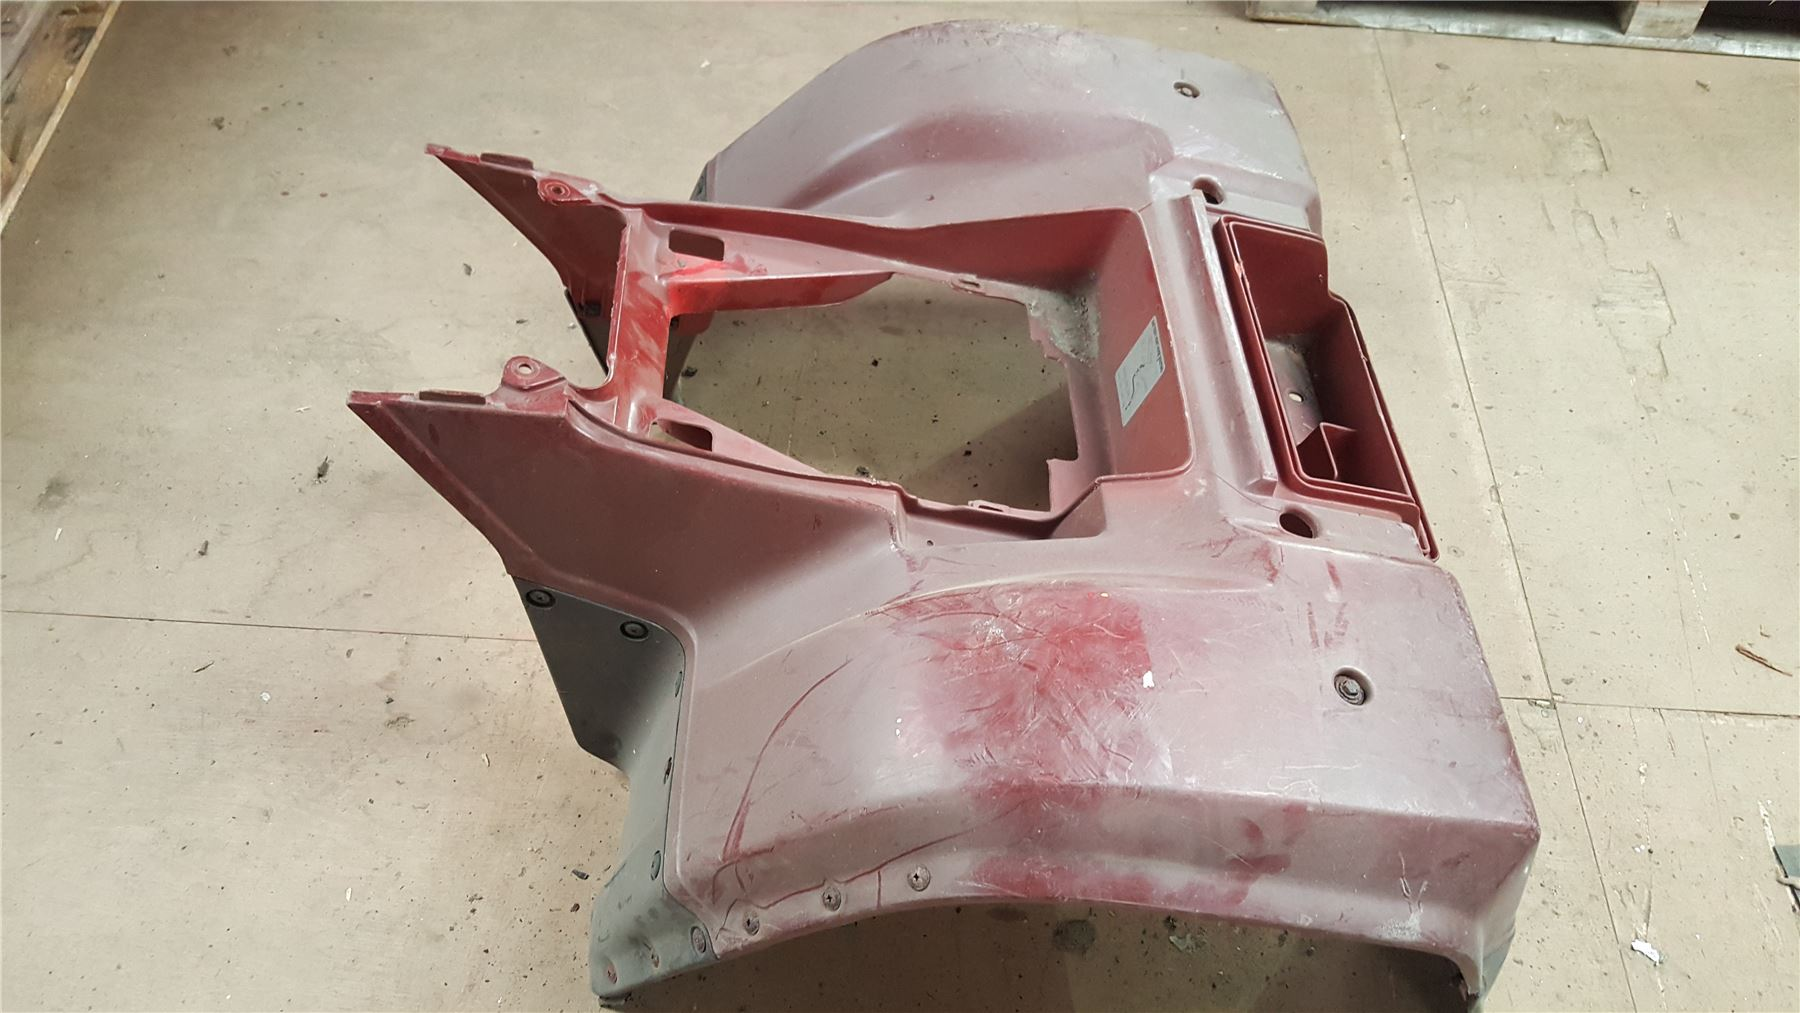 hight resolution of details about kawasaki klf 300 rear plastics atv fender